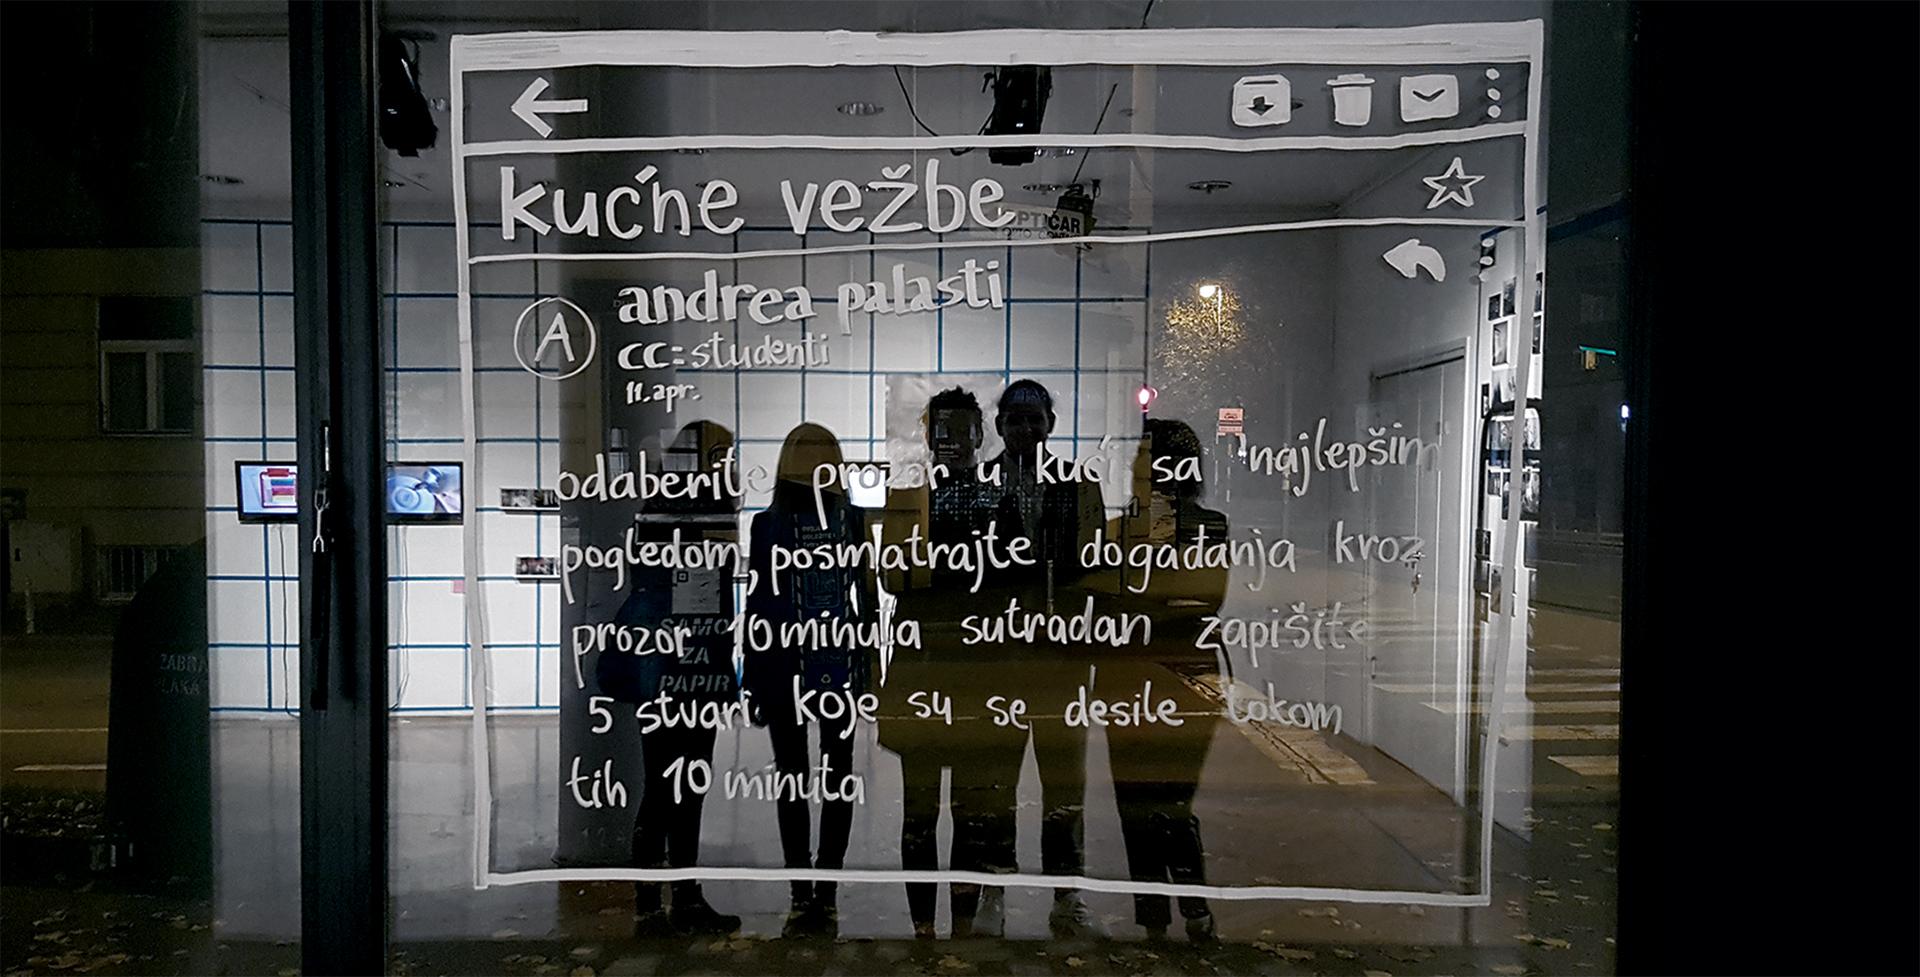 Andrea Palašti / Кućne vežbe